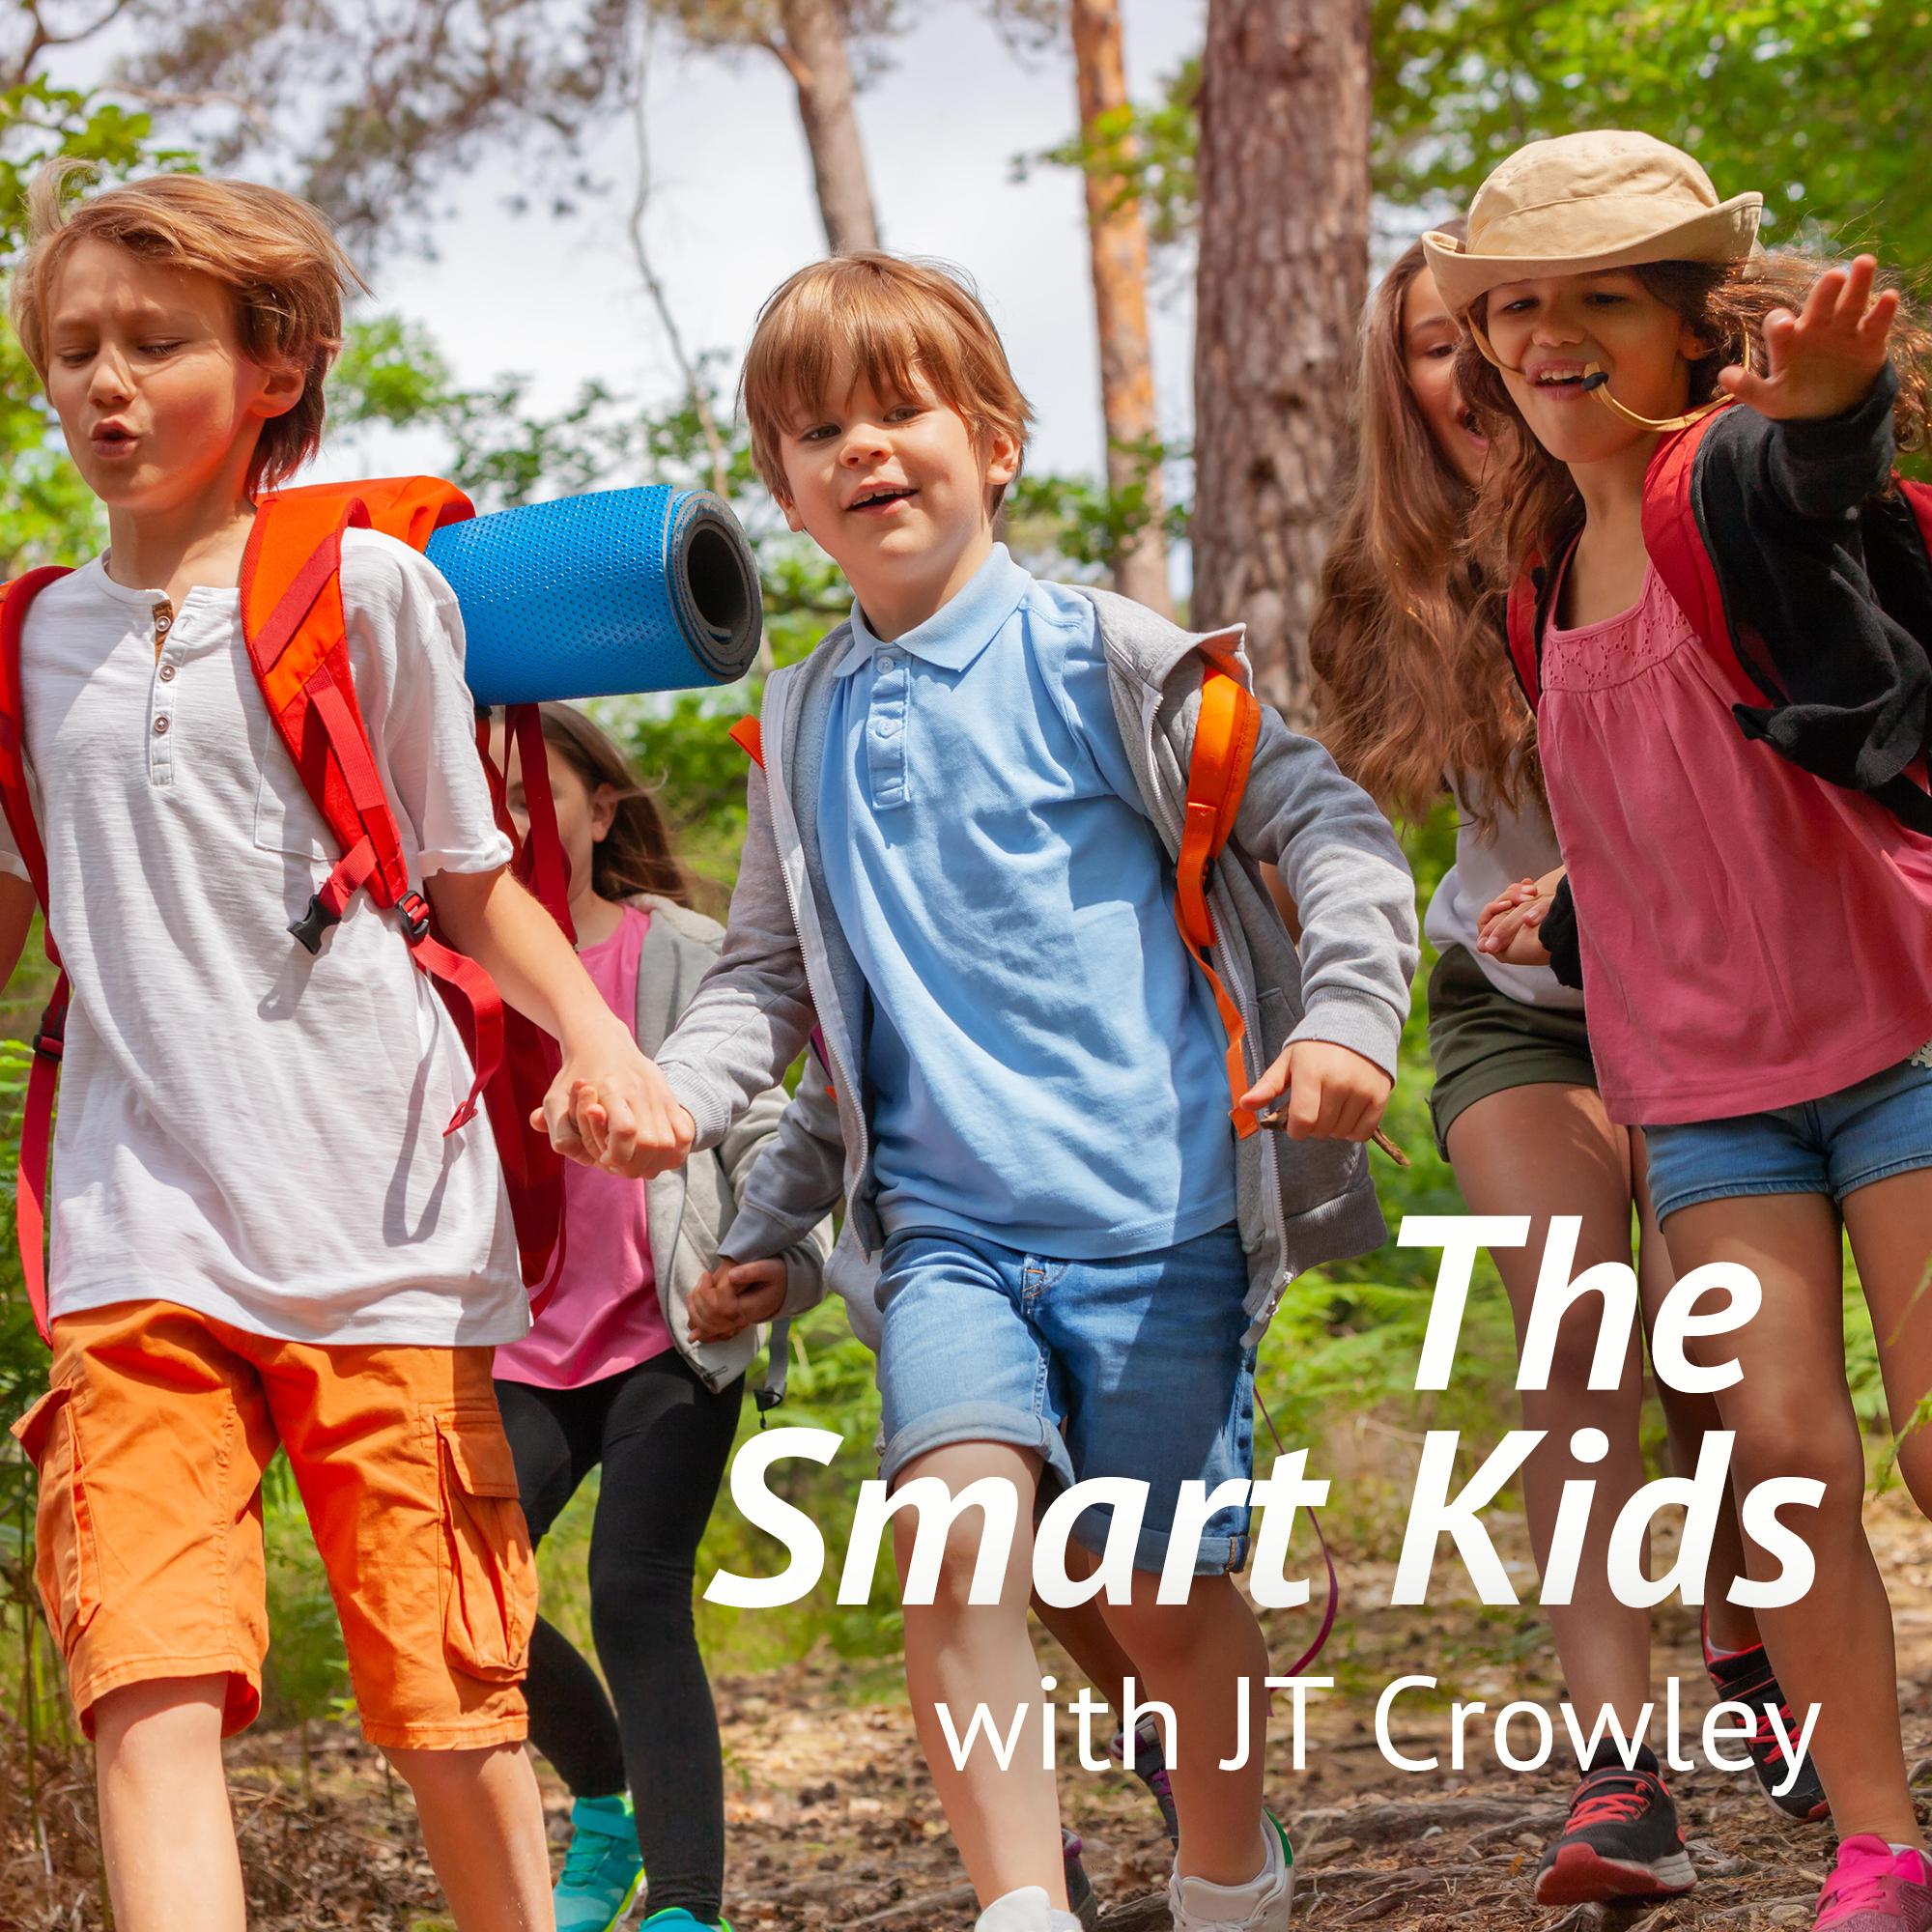 The Smart Kids